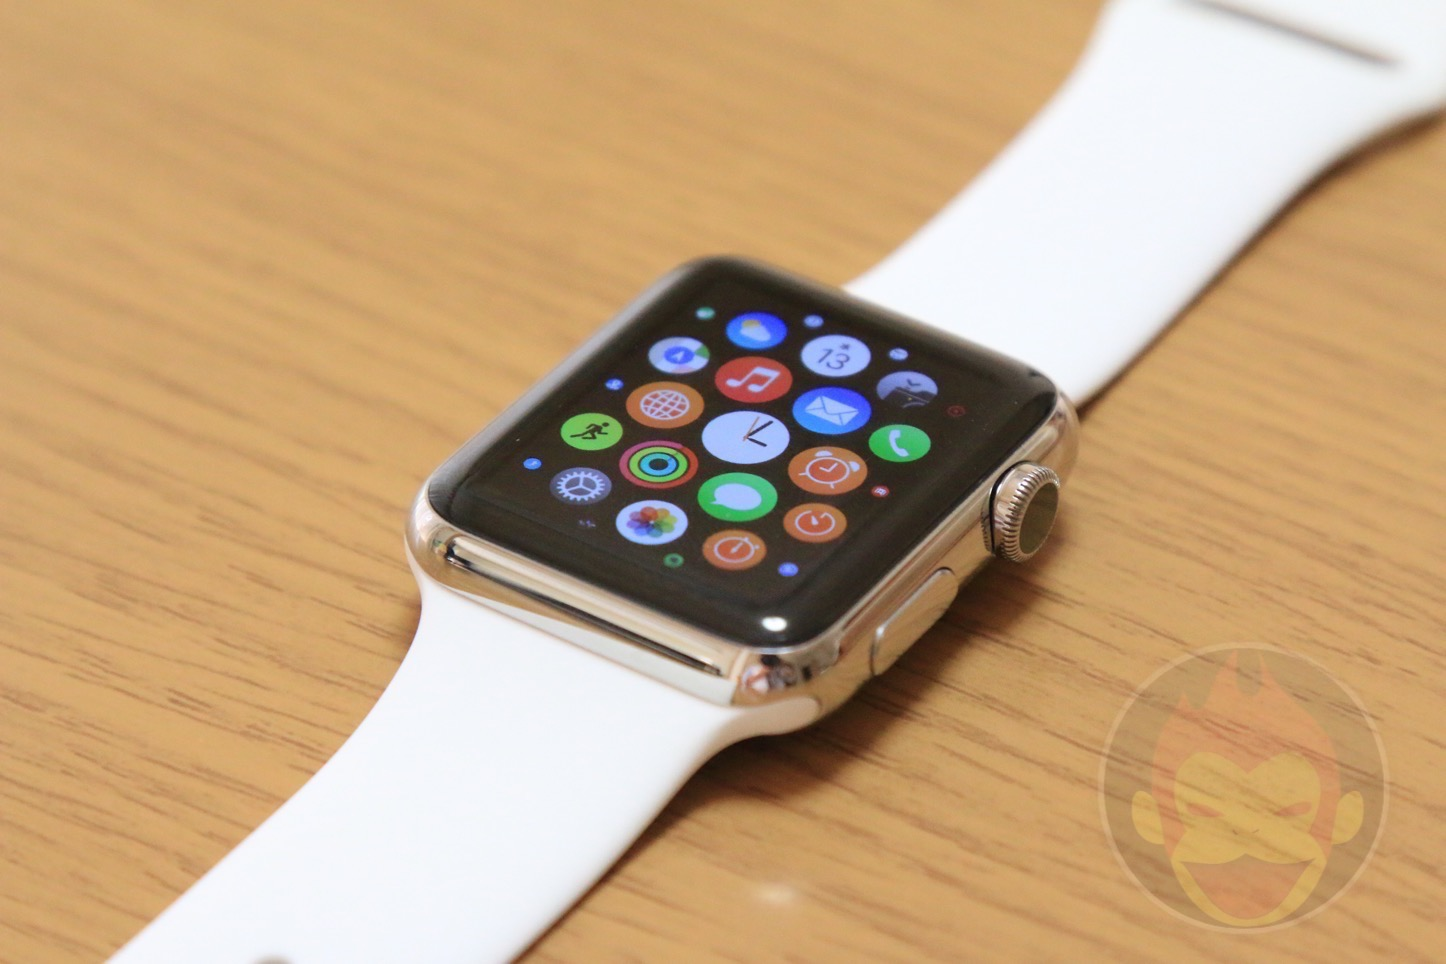 Apple-Watch-Usage-Review-002.JPG